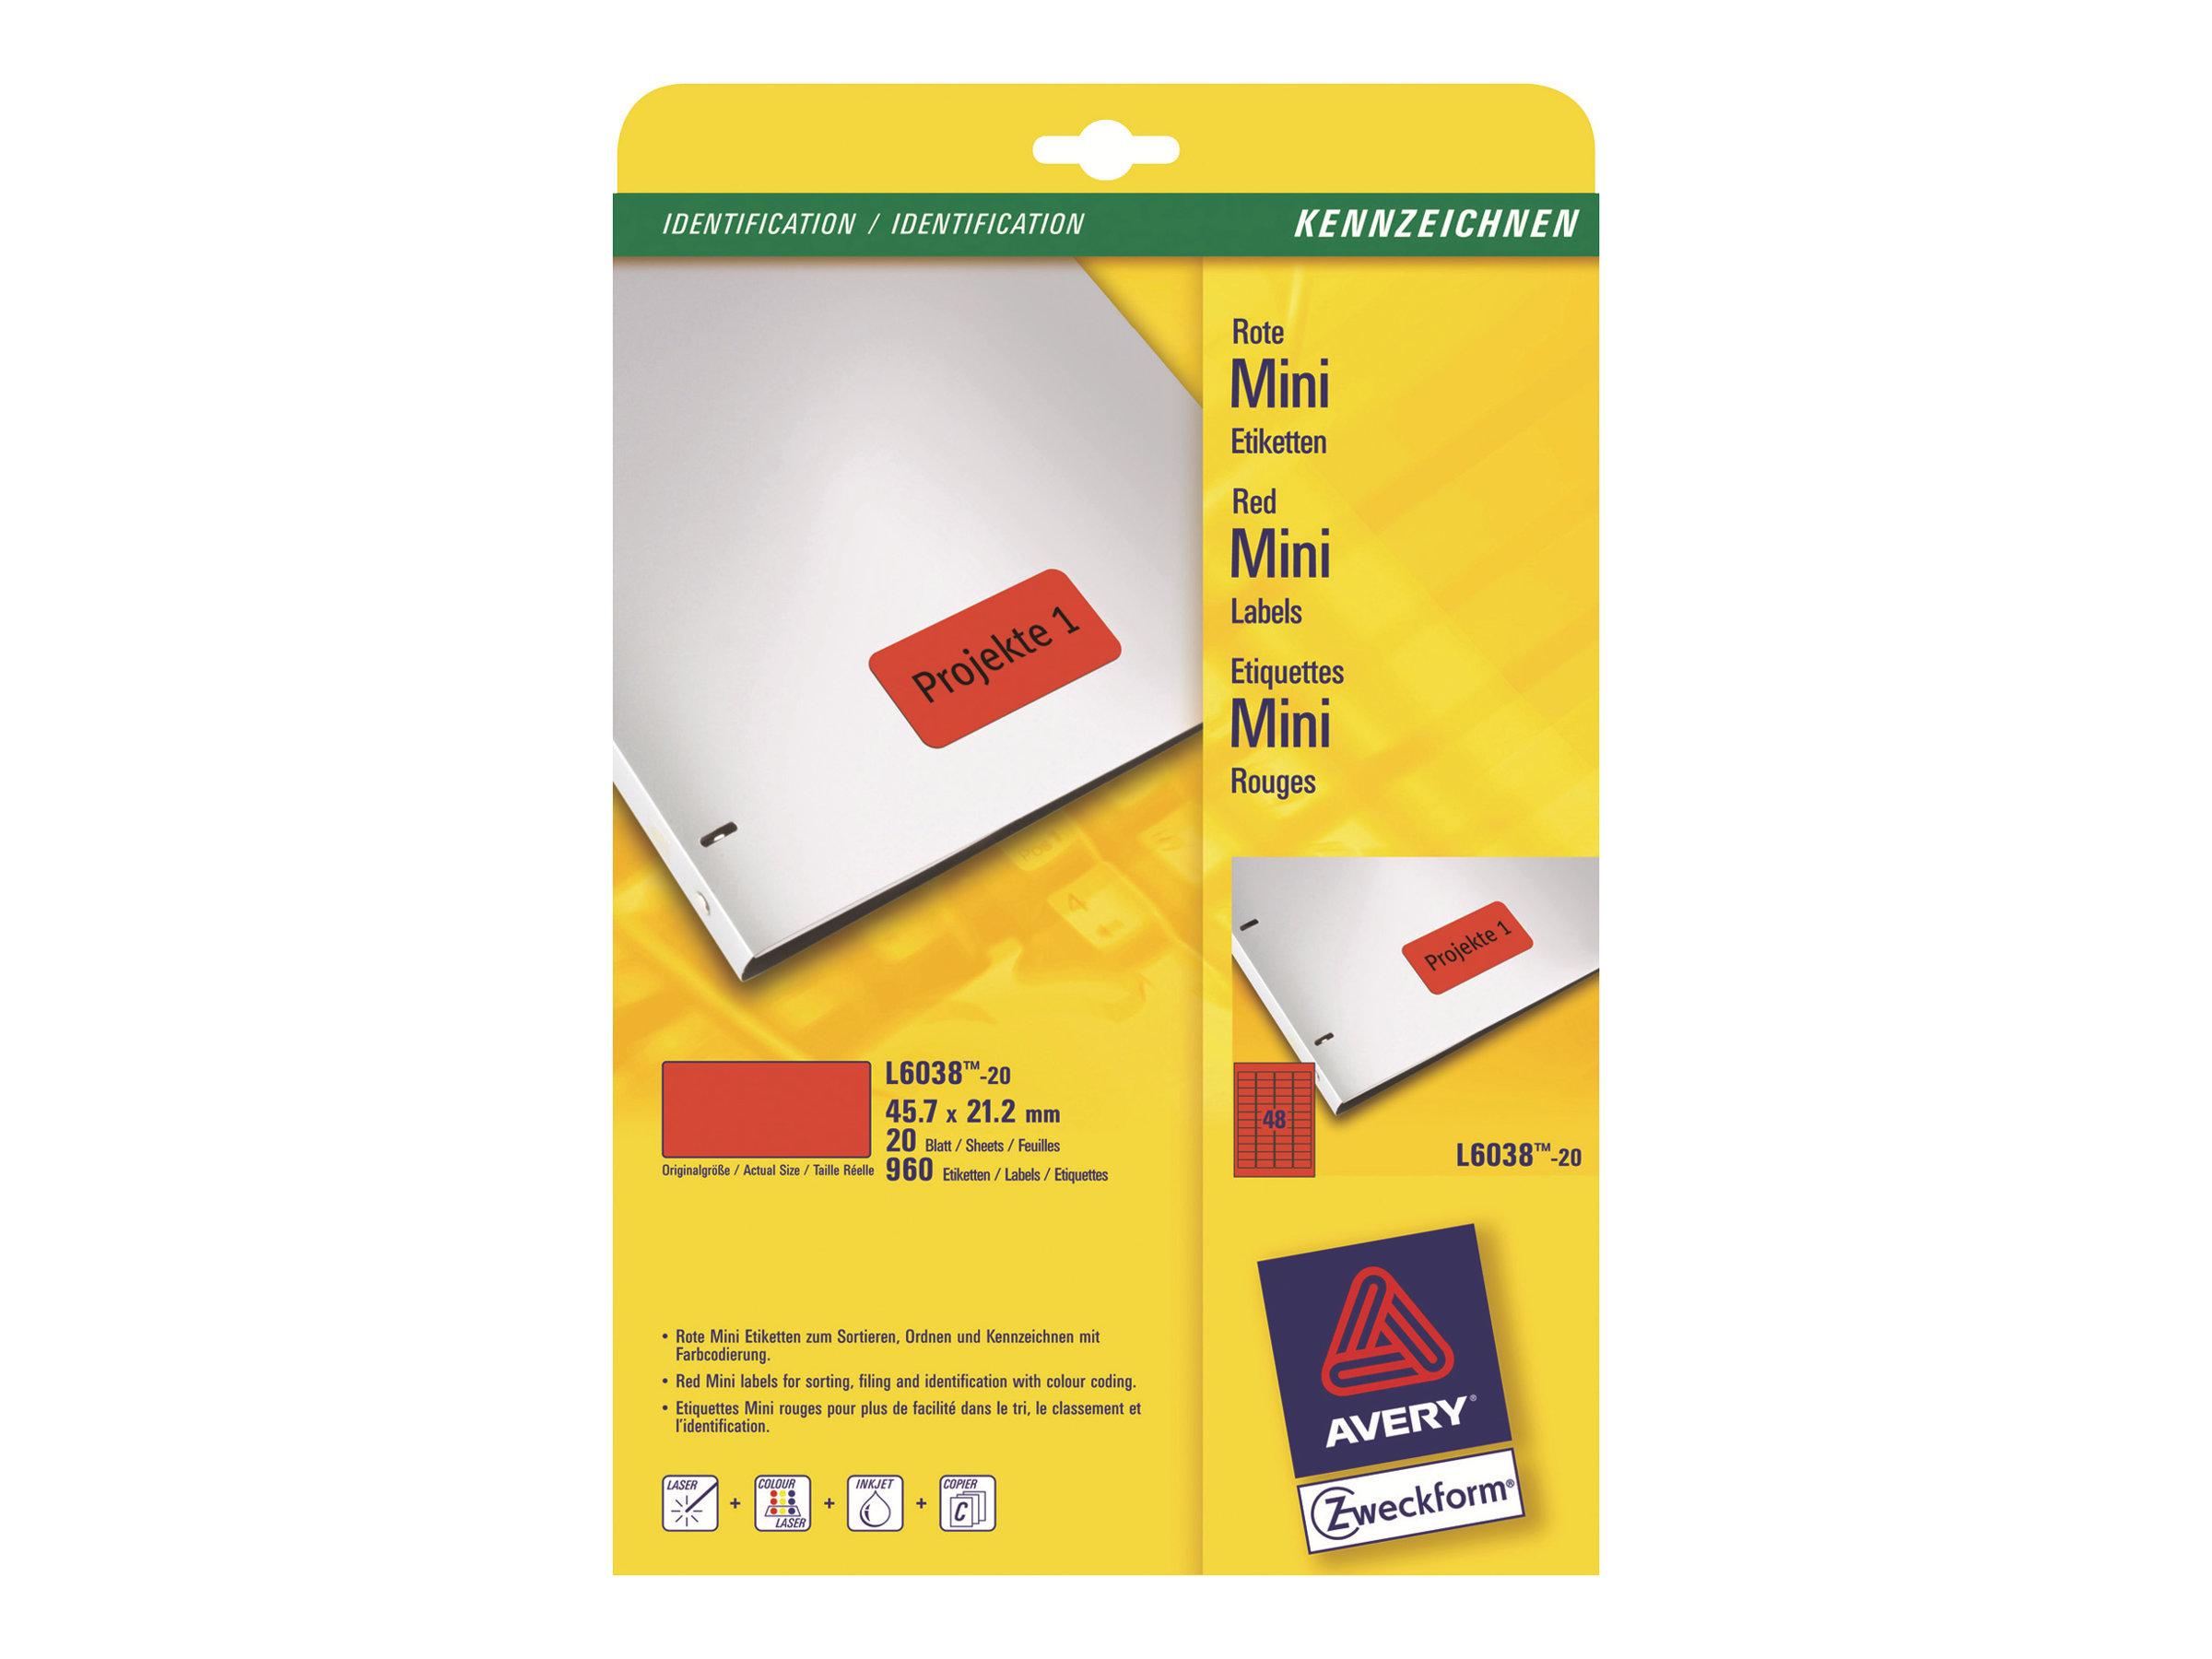 Avery Zweckform L6038 - Rot - 21.2 x 45.7 mm 960 Stck. (20 Bogen x 48) Etiketten